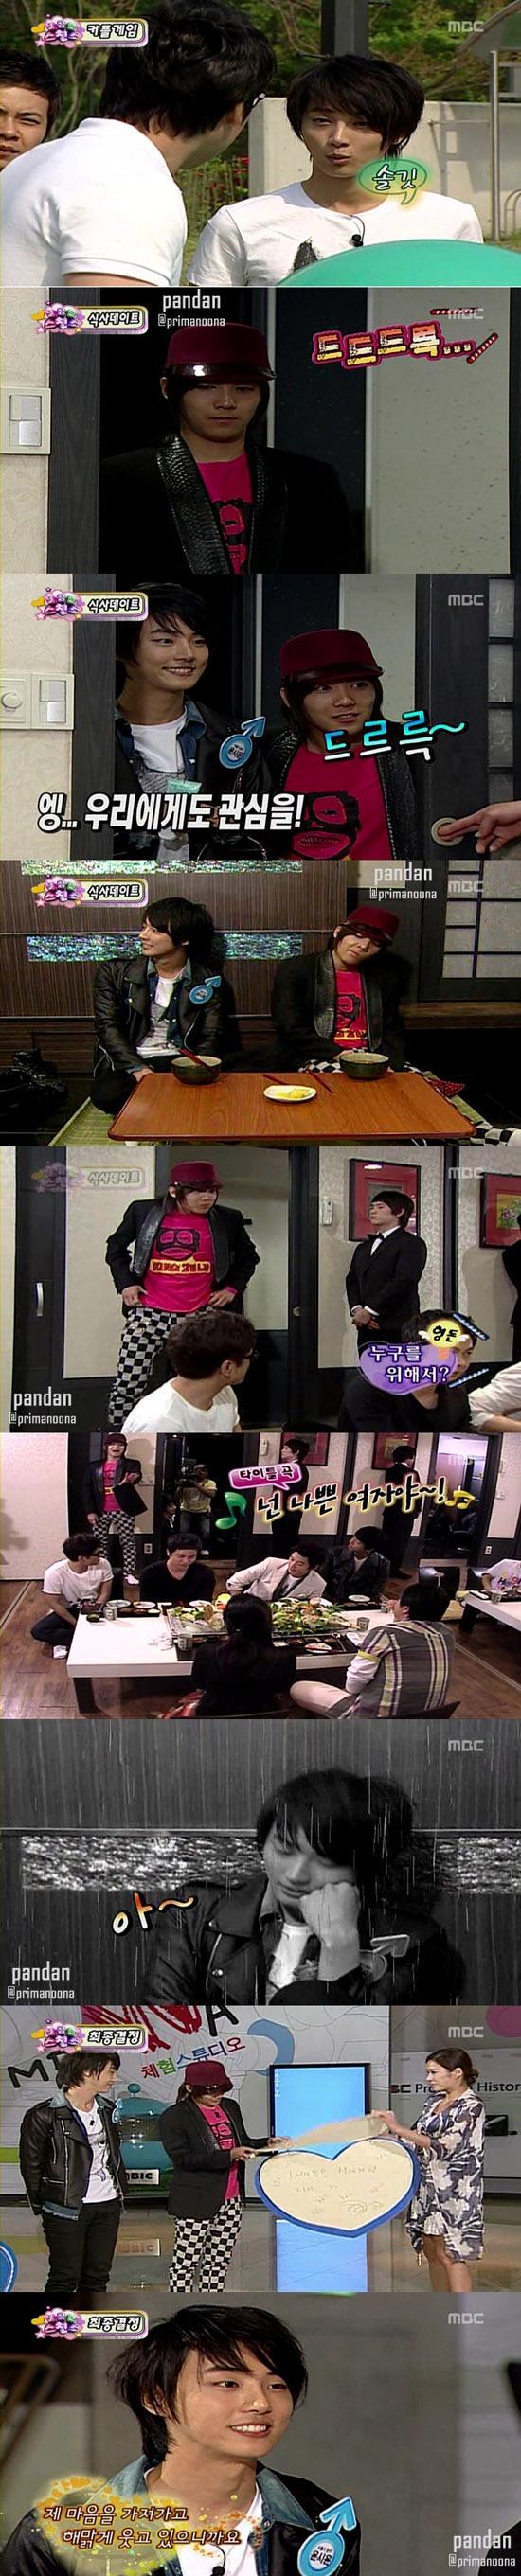 Yoon Shi Yoon And Lee Hong Ki A Life Full Of Memorie...